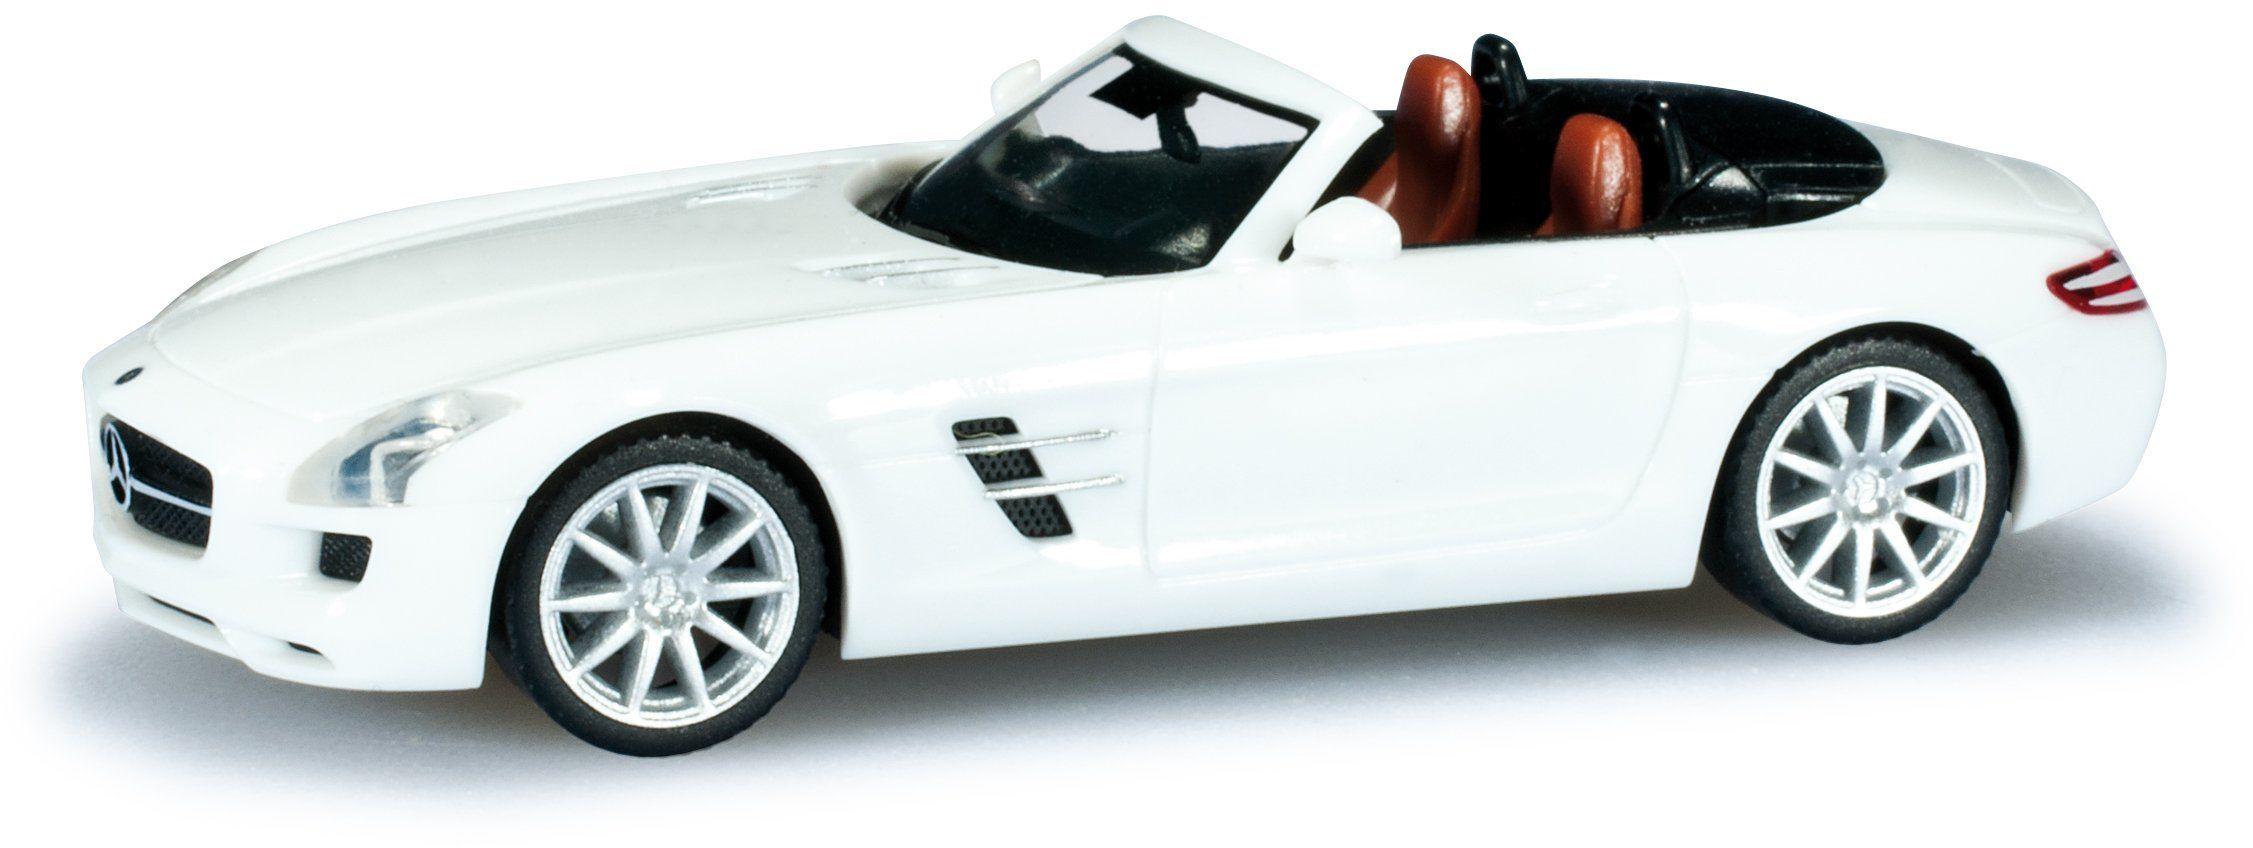 Herpa 024853 - Mercedes-Benz SLS AMG Roadster, model miniaturowy